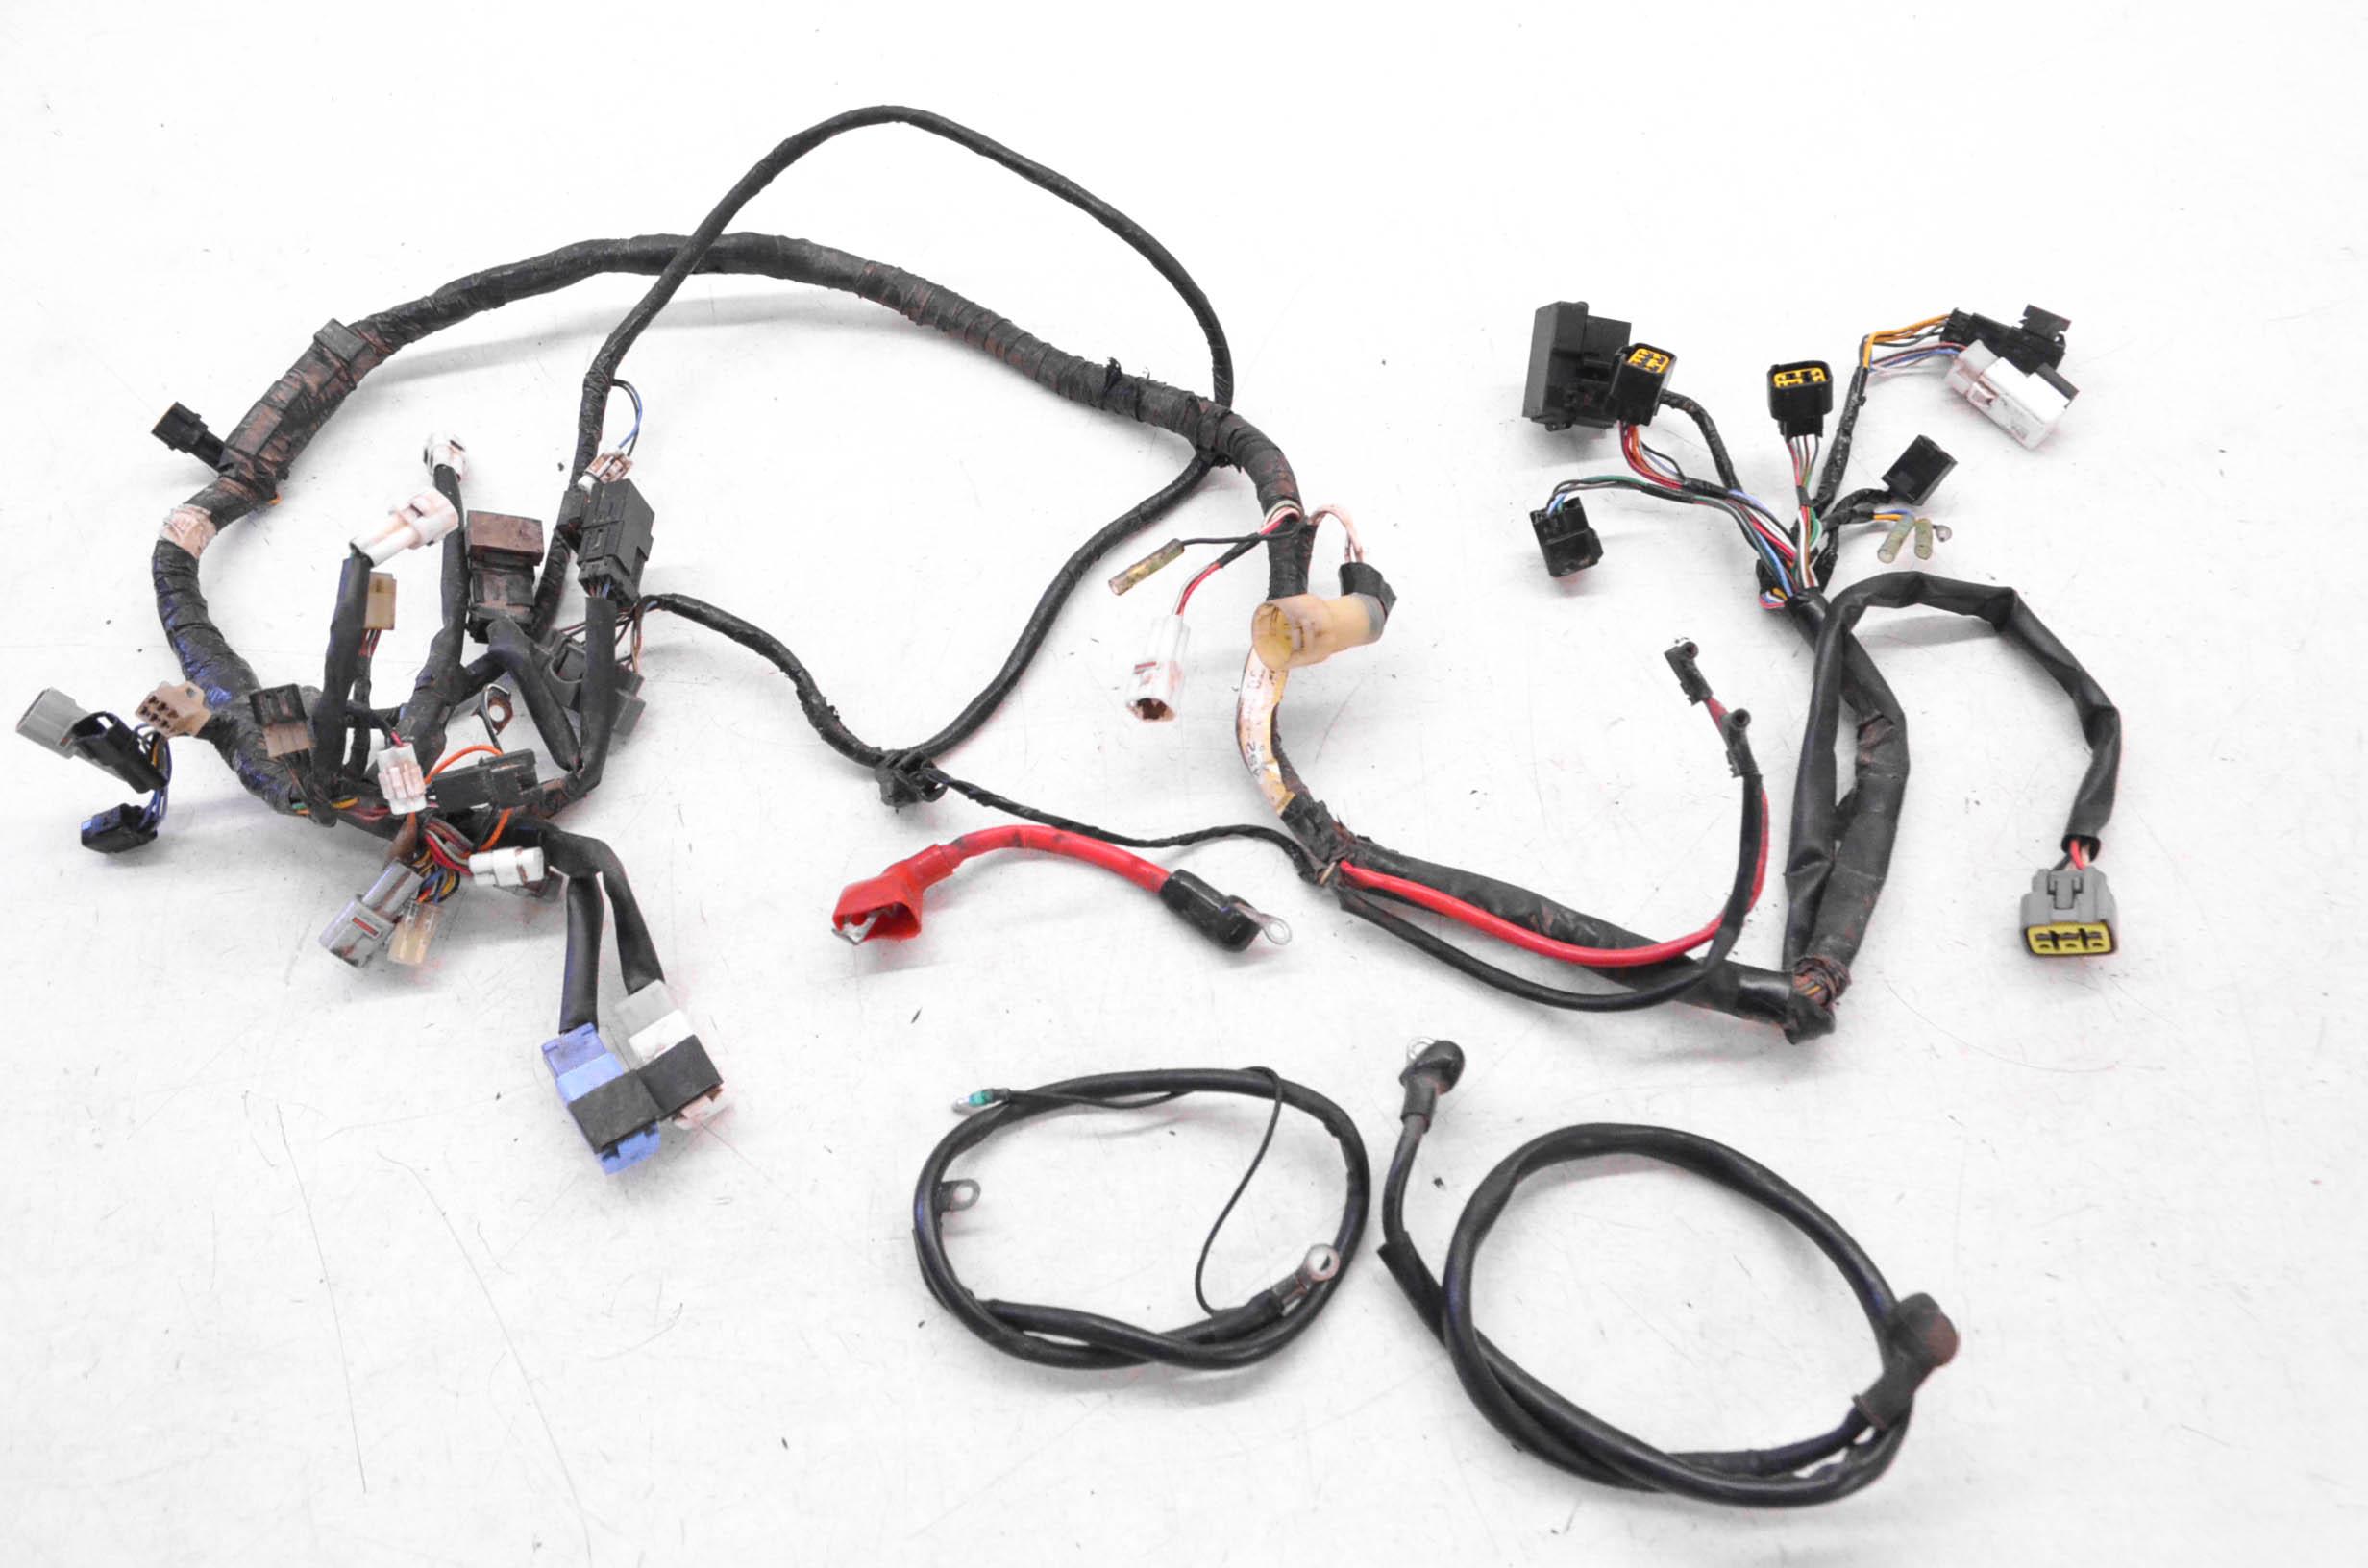 08 Yamaha Big Bear 350 Wire Harness Electrical Wiring